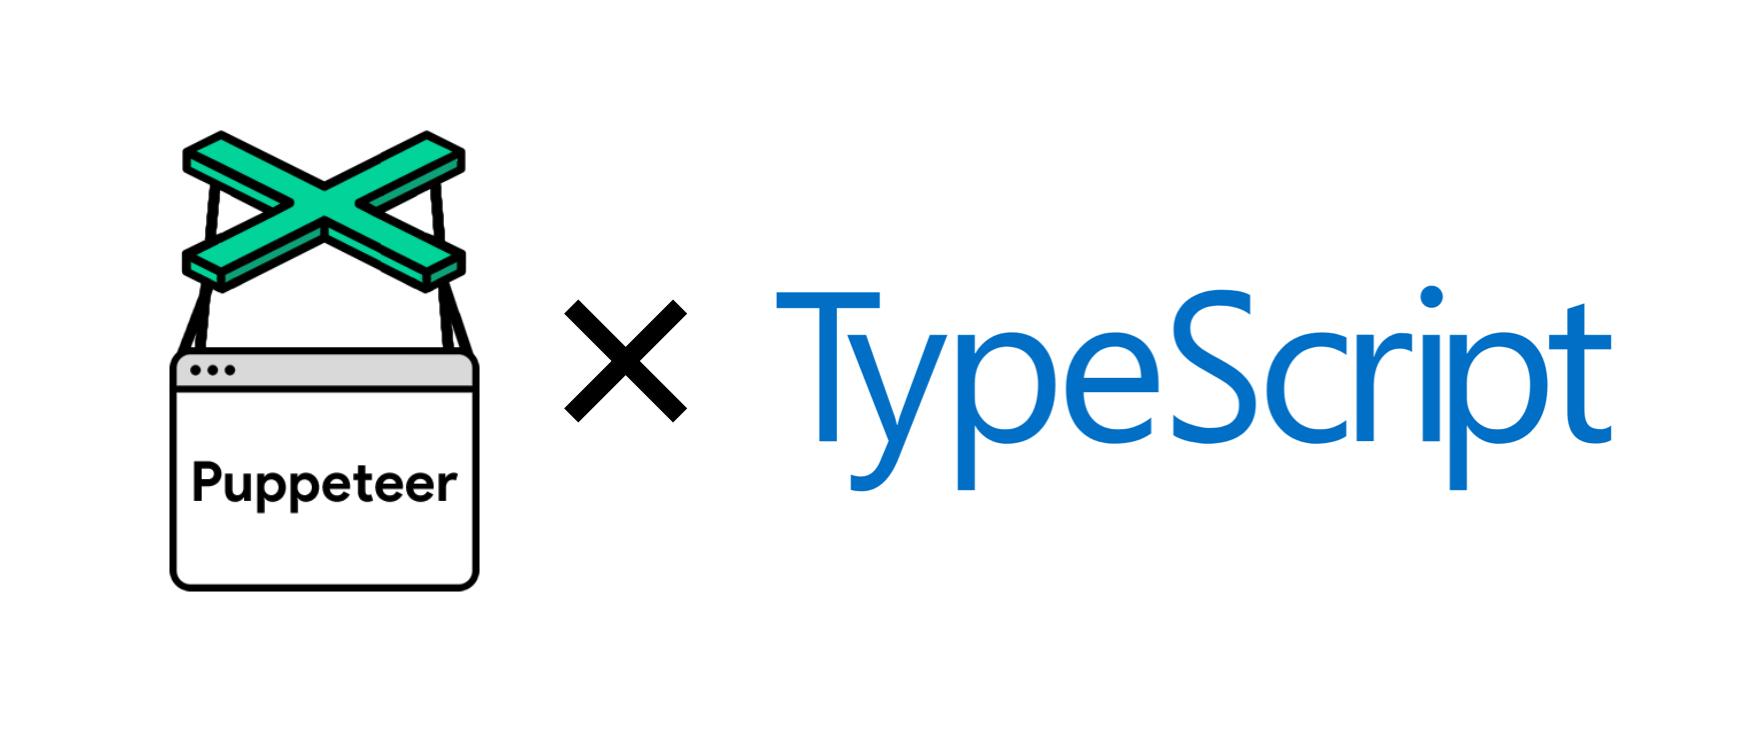 Using Puppeteer in TypeScript